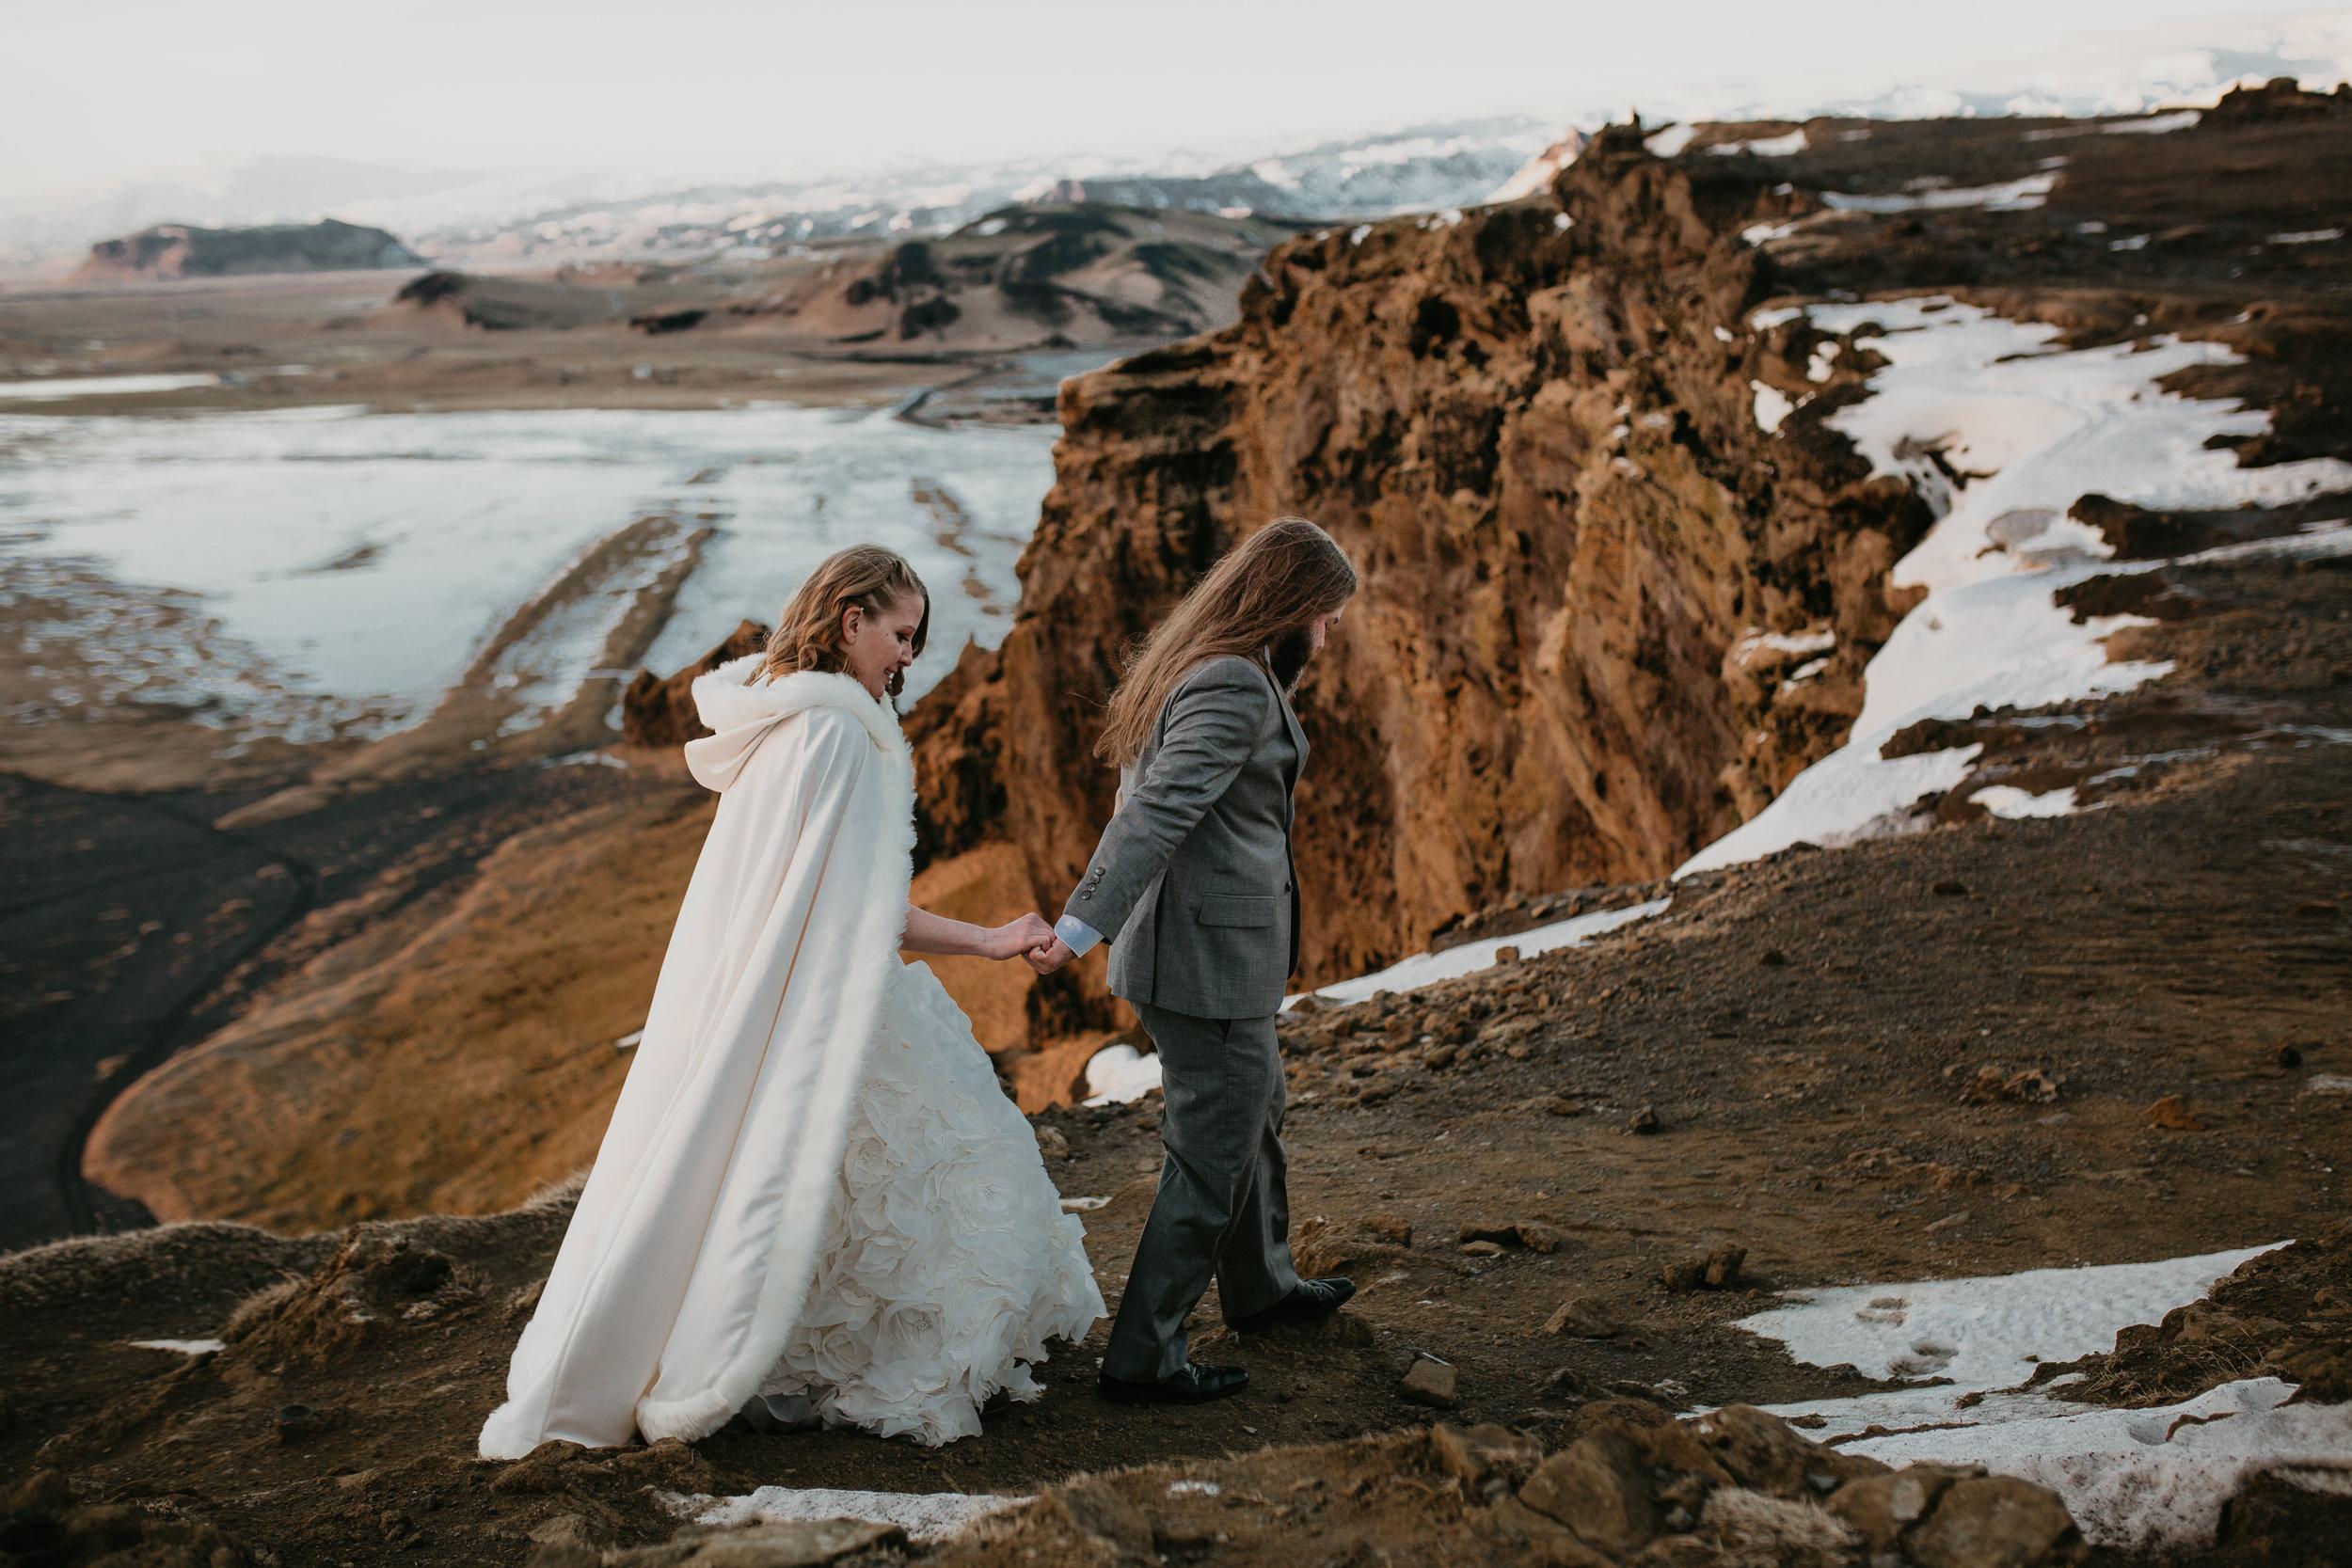 nicole-daacke-photography-iceland-winter-sunset-adventure-elopement-skogafoss-waterfall-black-sand-beach-dyrholaey-vik-iceland-intimate-wedding-black-church-elopement-photographer-43.jpg